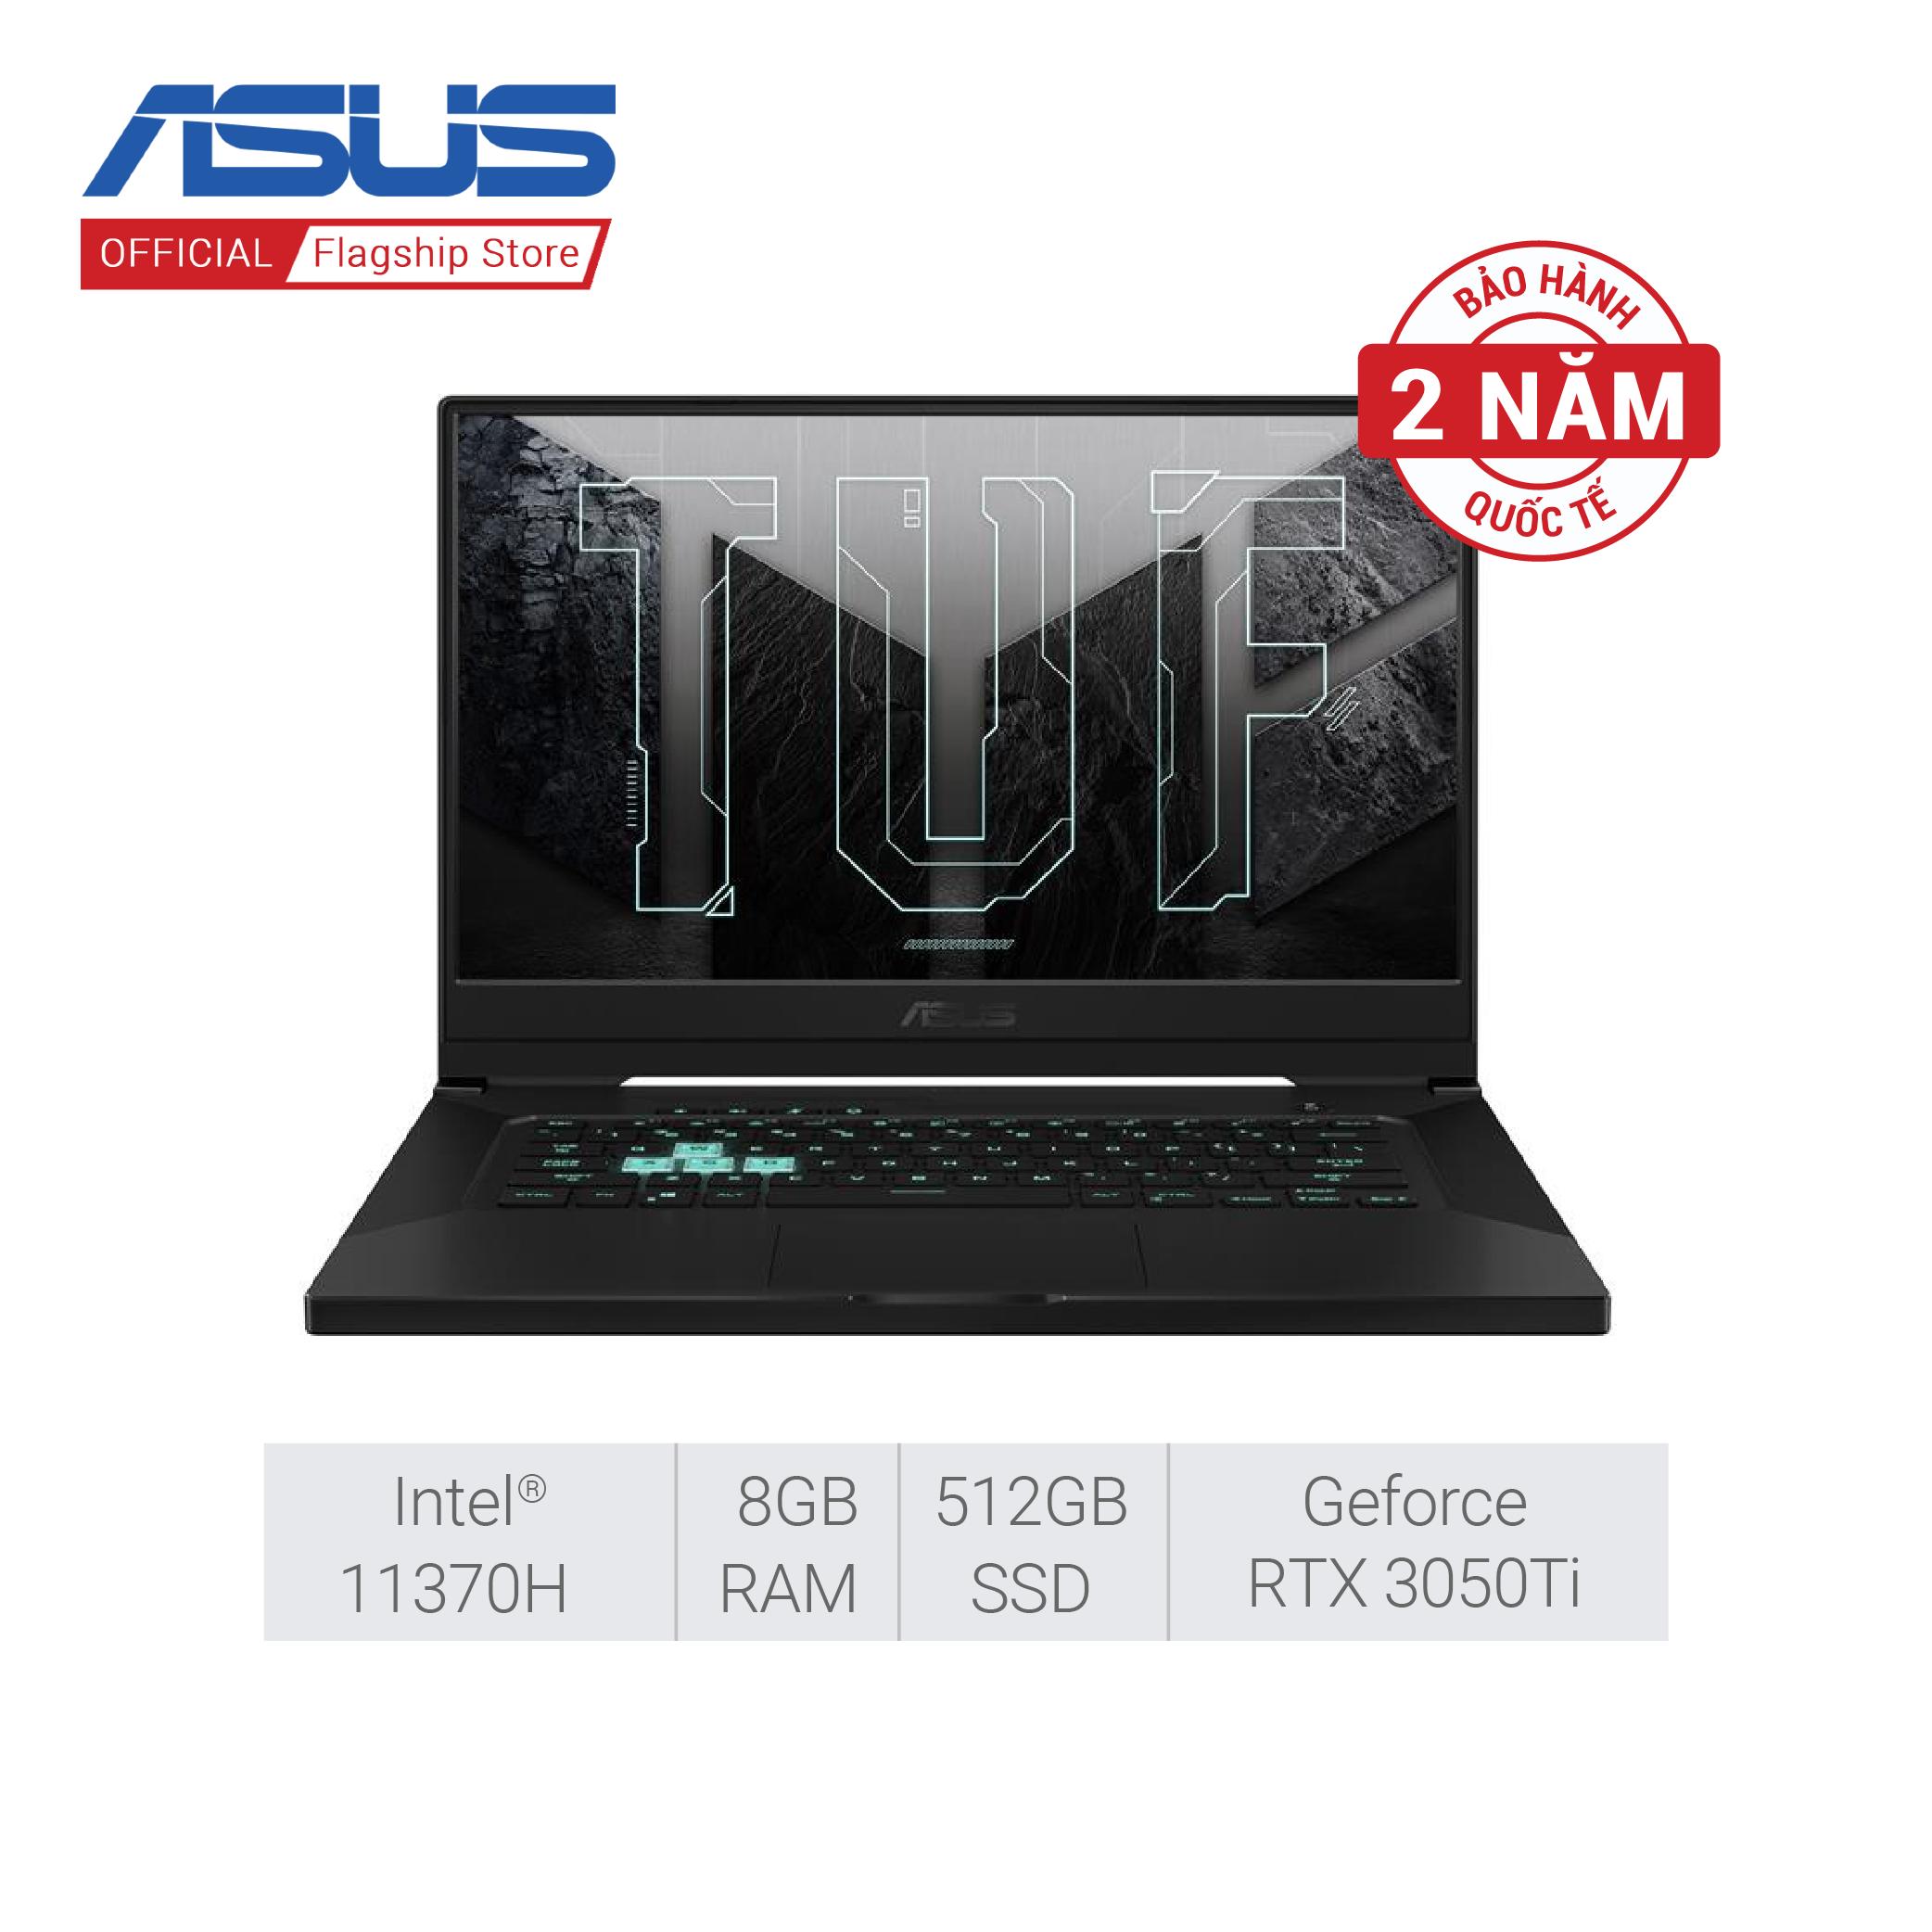 [SUPER SALE 21.09] Laptop Gaming Asus TUF FX516PE-HN005T (Core i7-1137H/8GB RAM/512GB SSD/15.6-inch FHD 144hz/4GD6_RTX3050Ti/Win10)